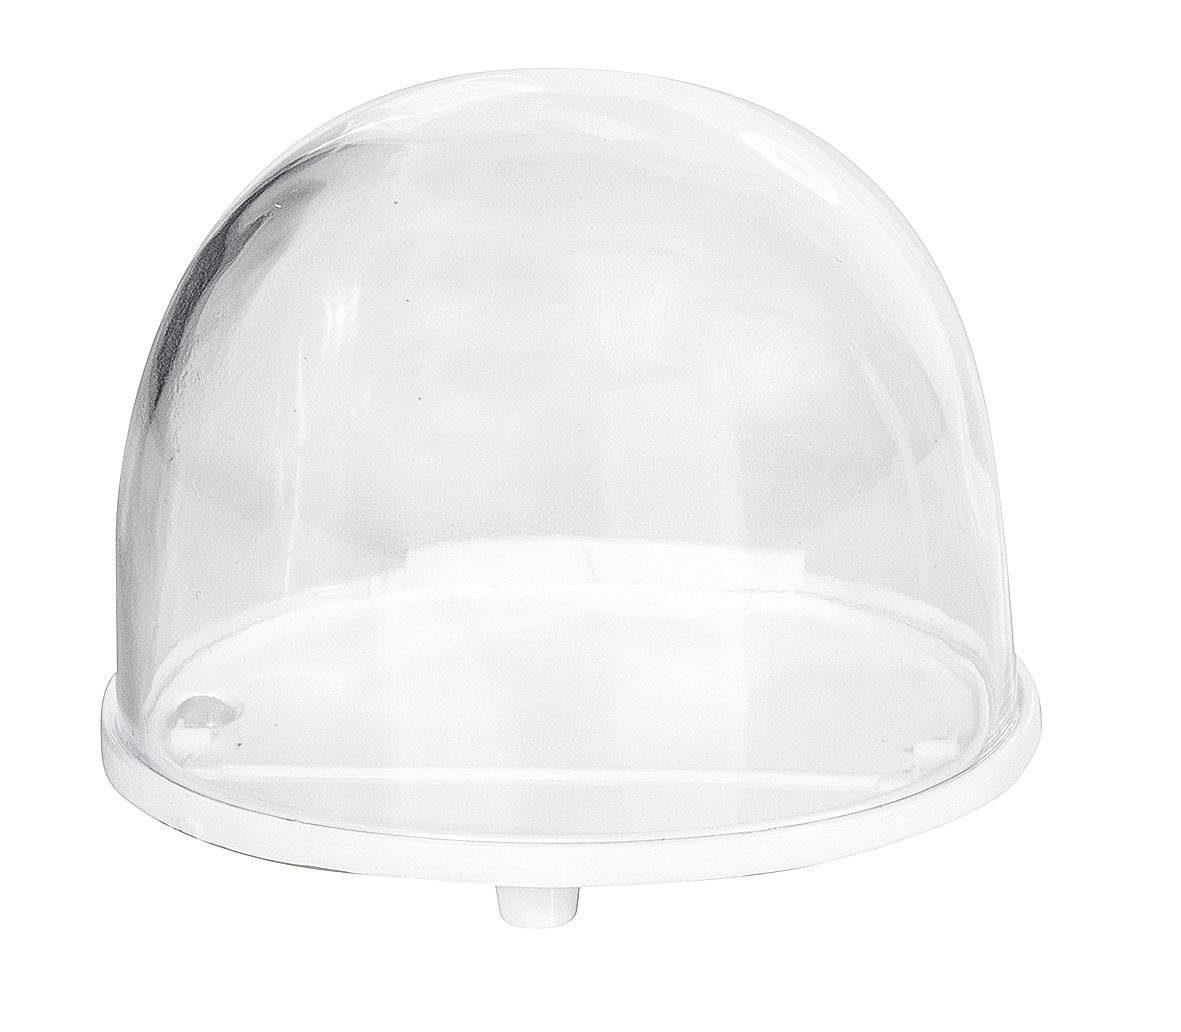 Traumkugel Oval, 7 x 5,5 x 5,5 cm